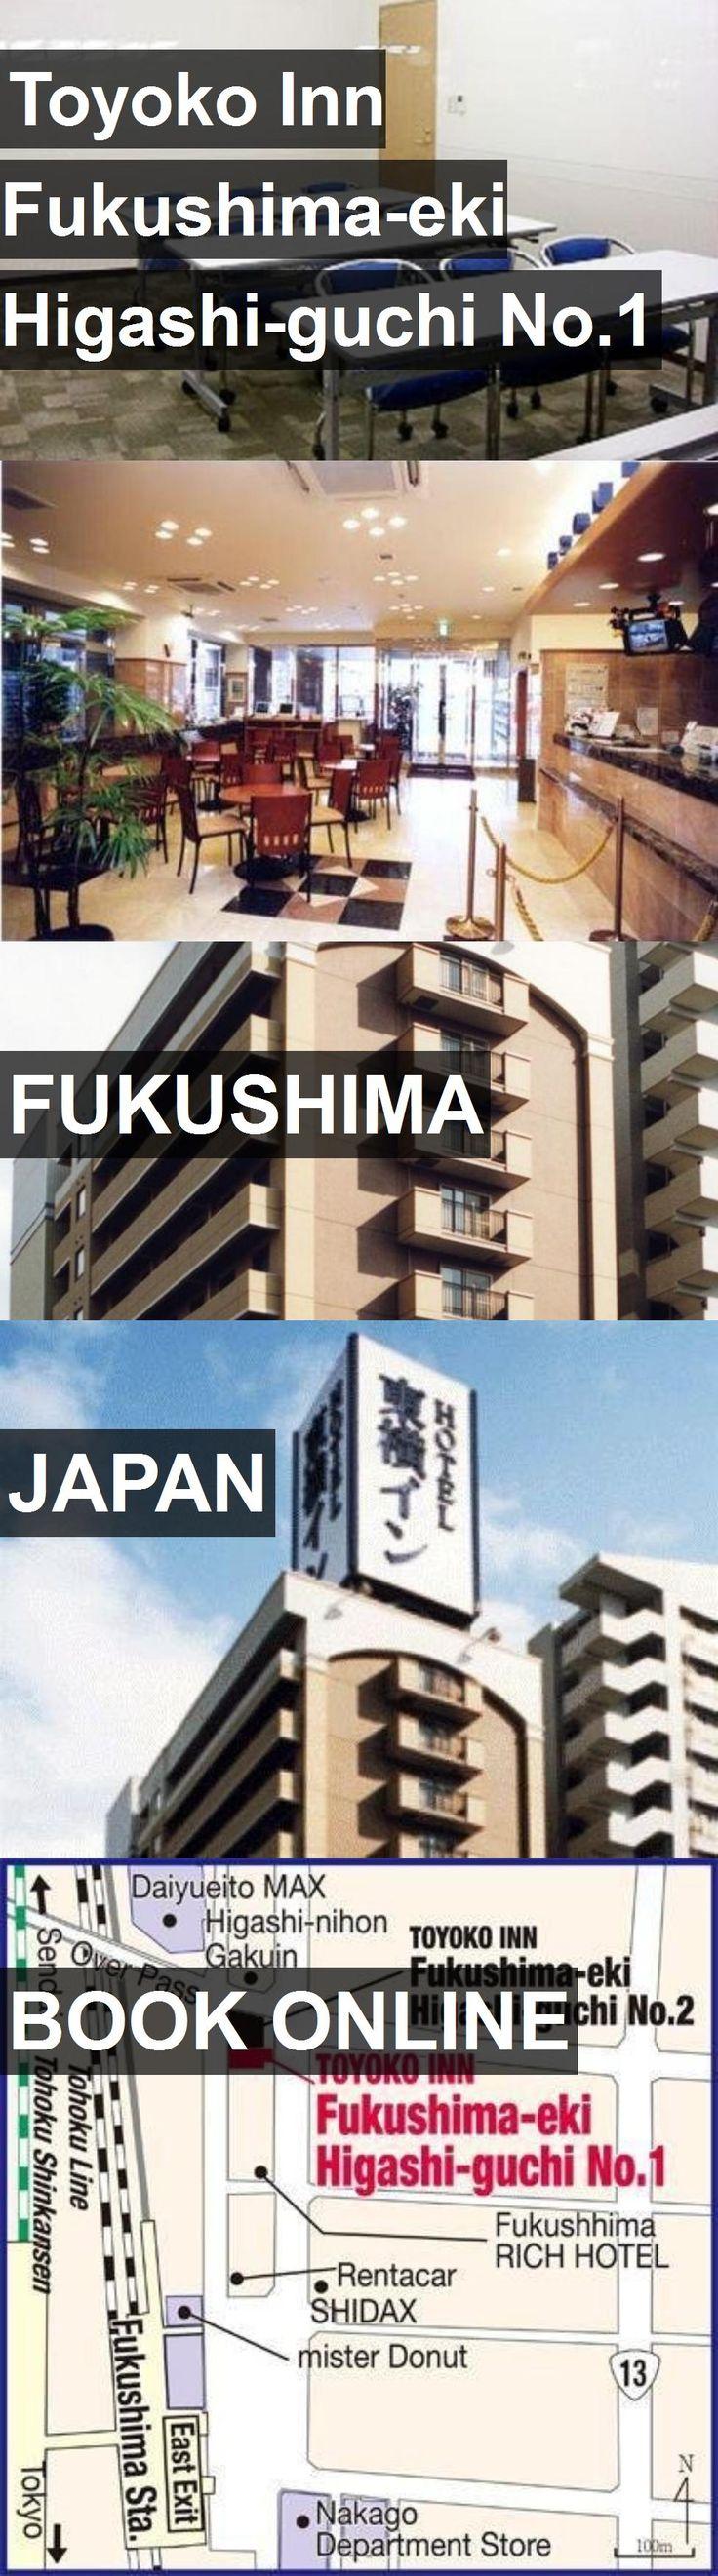 Hotel Toyoko Inn Fukushima-eki Higashi-guchi No.1 in Fukushima, Japan. For more information, photos, reviews and best prices please follow the link. #Japan #Fukushima #travel #vacation #hotel